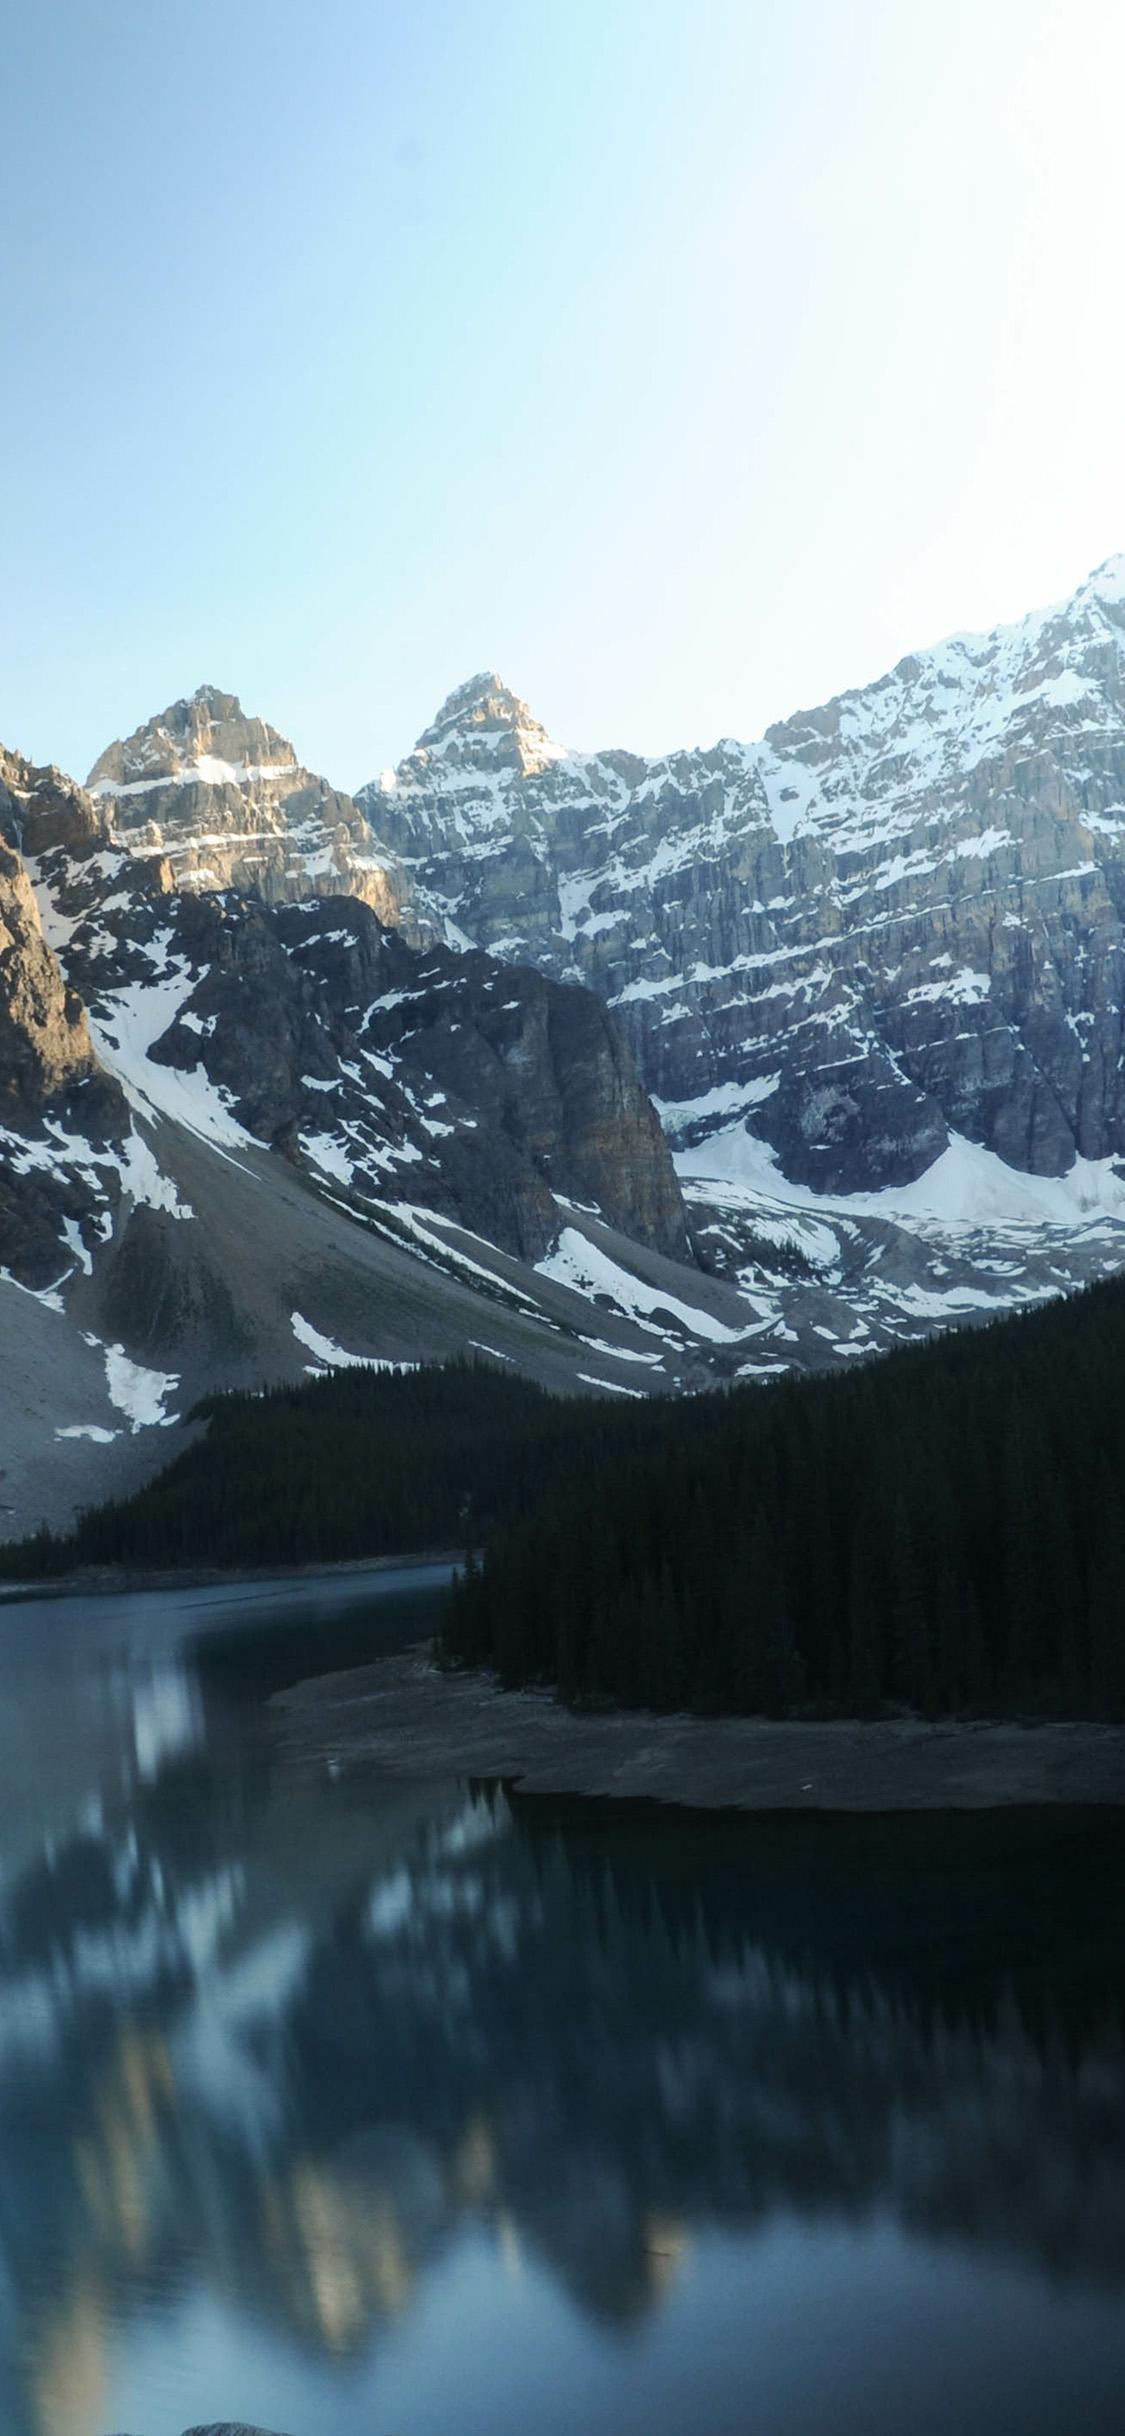 iPhonexpapers.com-Apple-iPhone-wallpaper-od96-nature-lake-mountain-snow